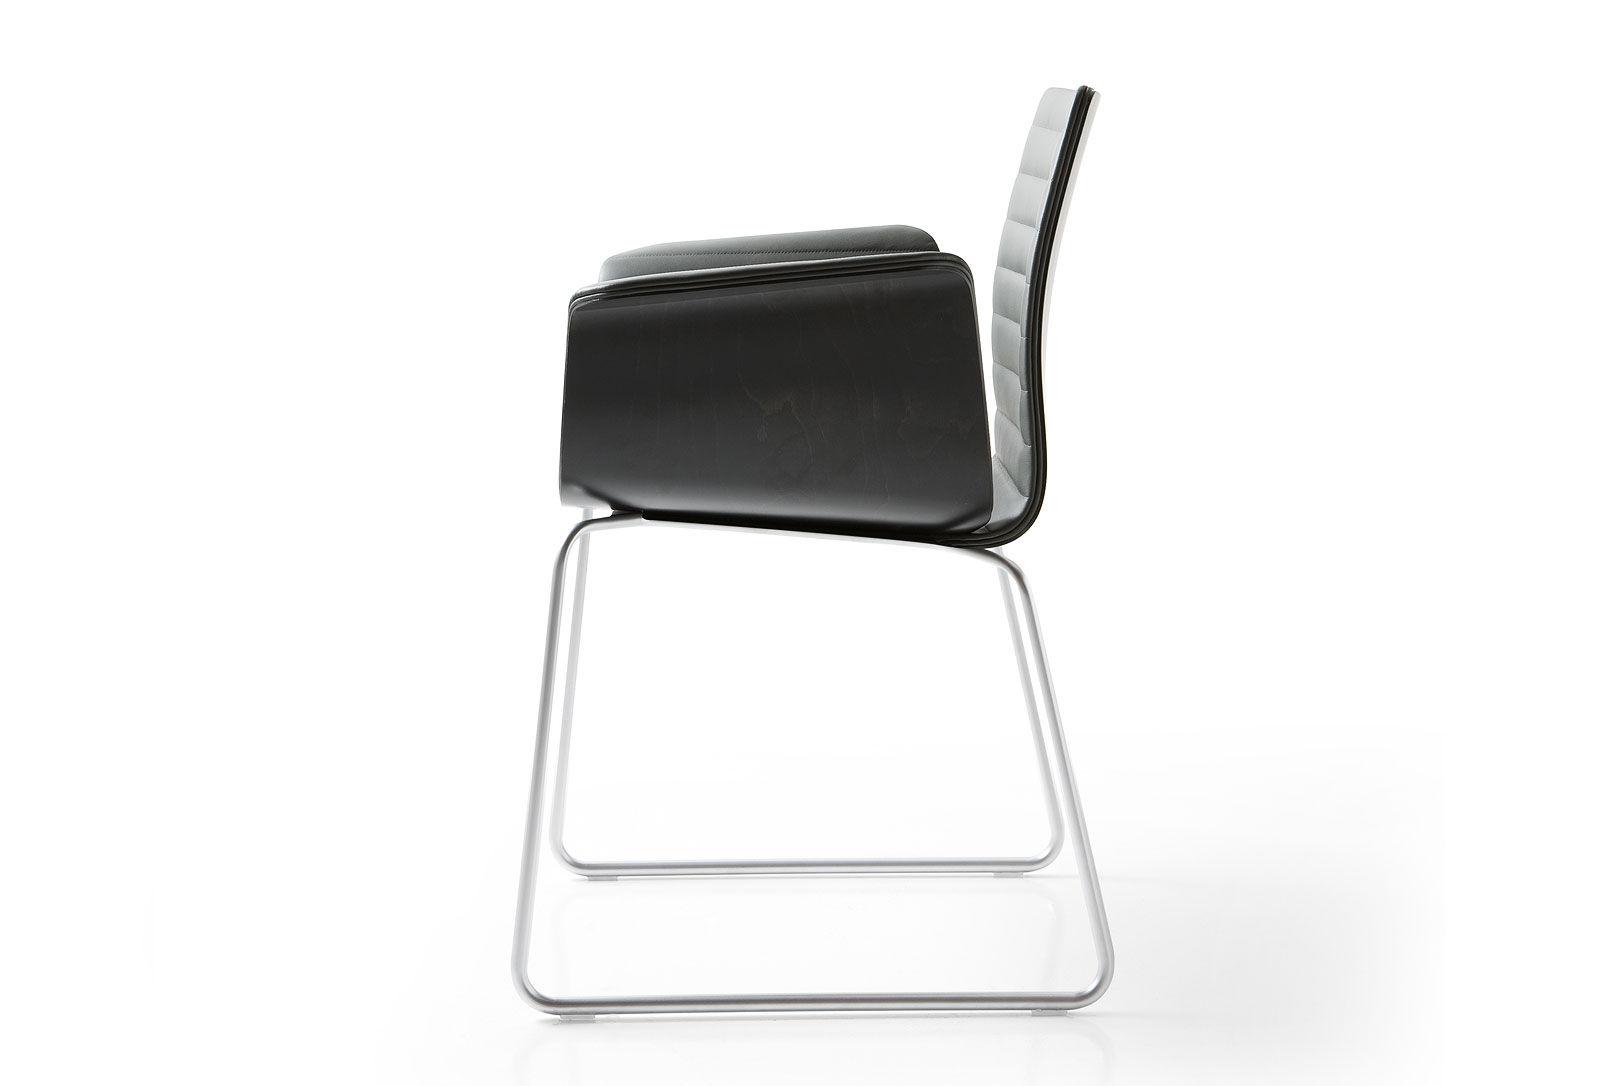 Sedie A Rotelle Schienale Alto : Sedie schienale alto economiche tag sedie schienale alto sala